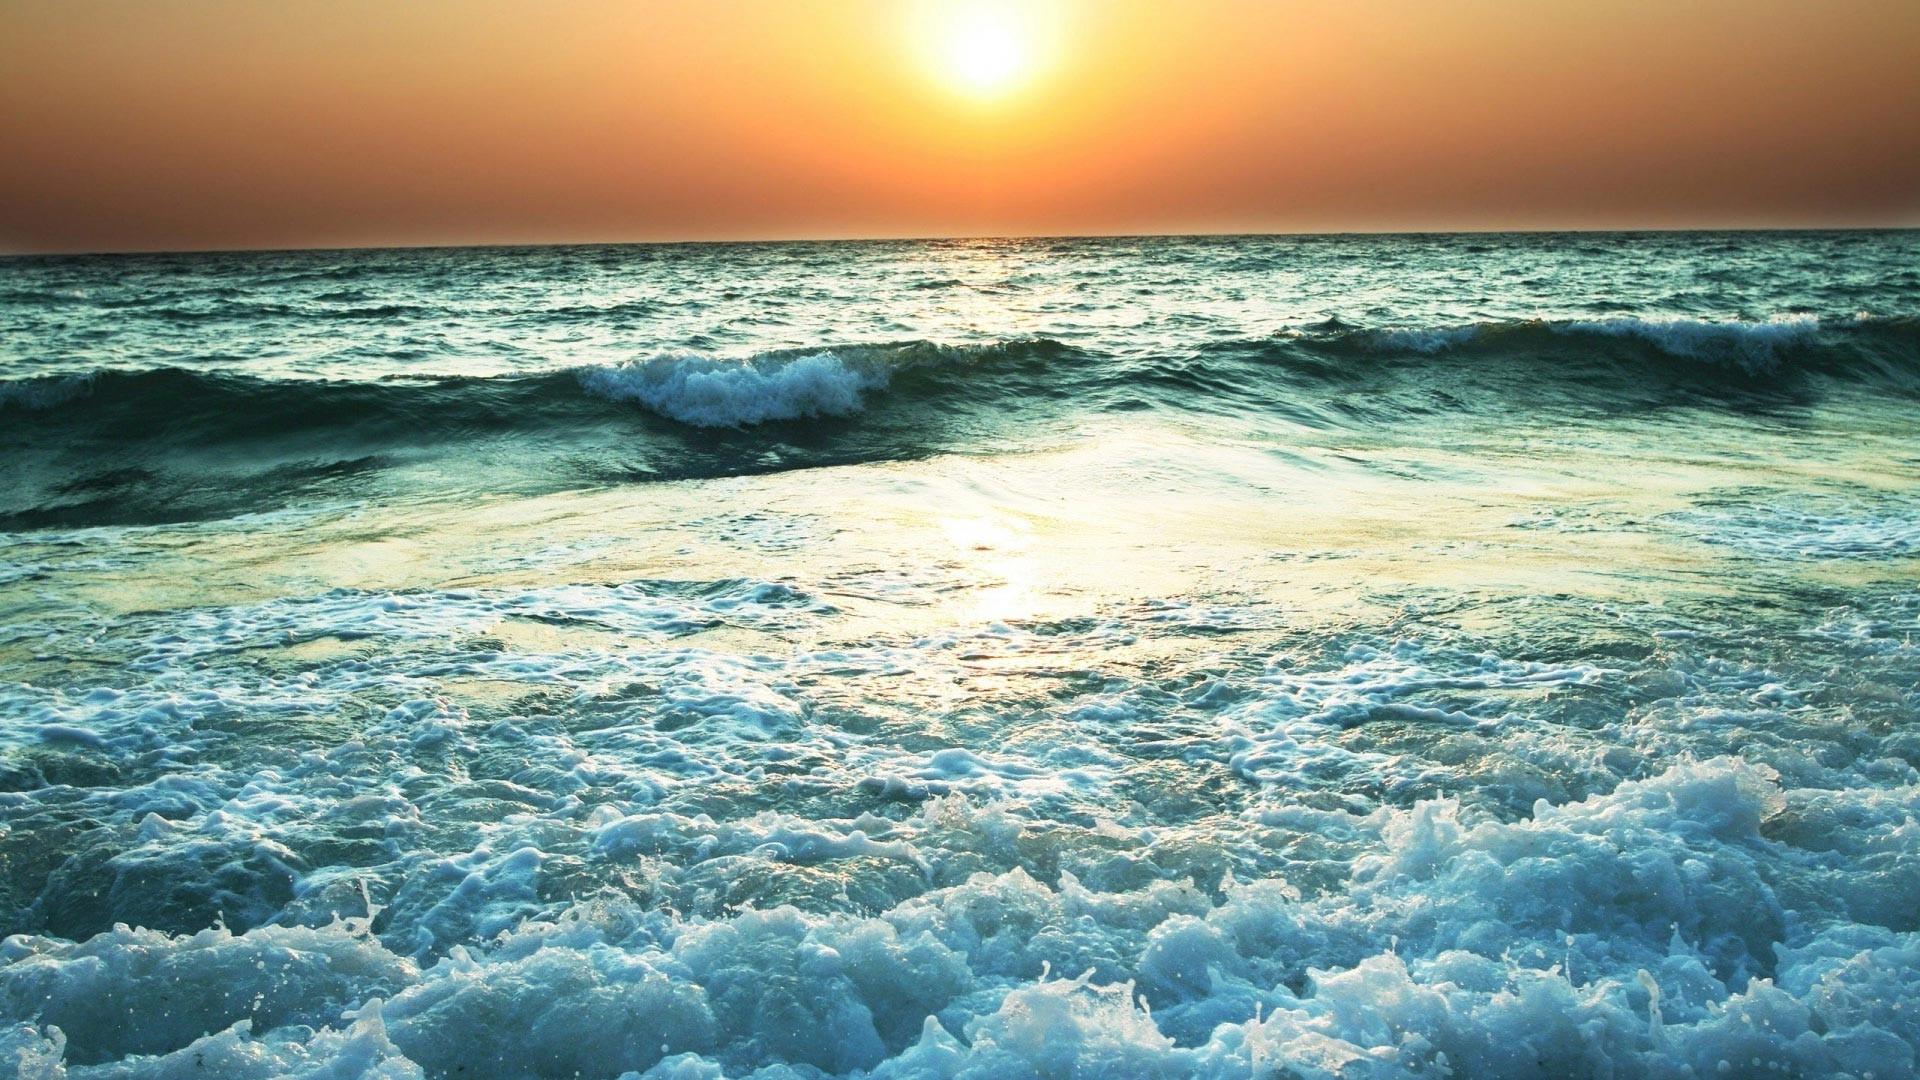 Sea Download Wallpaper